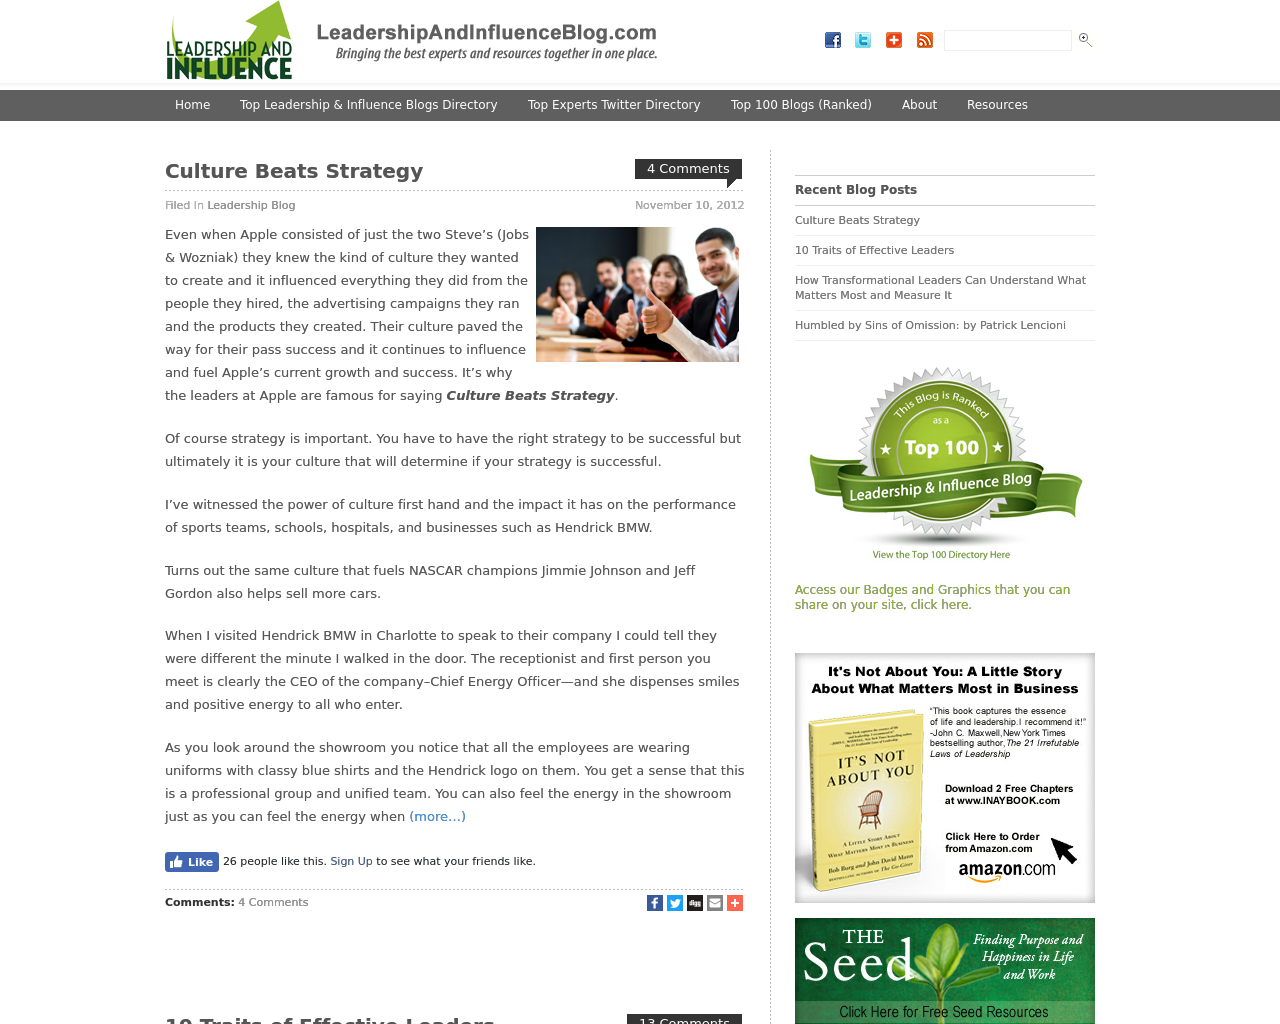 LeadershipAndInfluenceBlog.com-Advertising-Reviews-Pricing